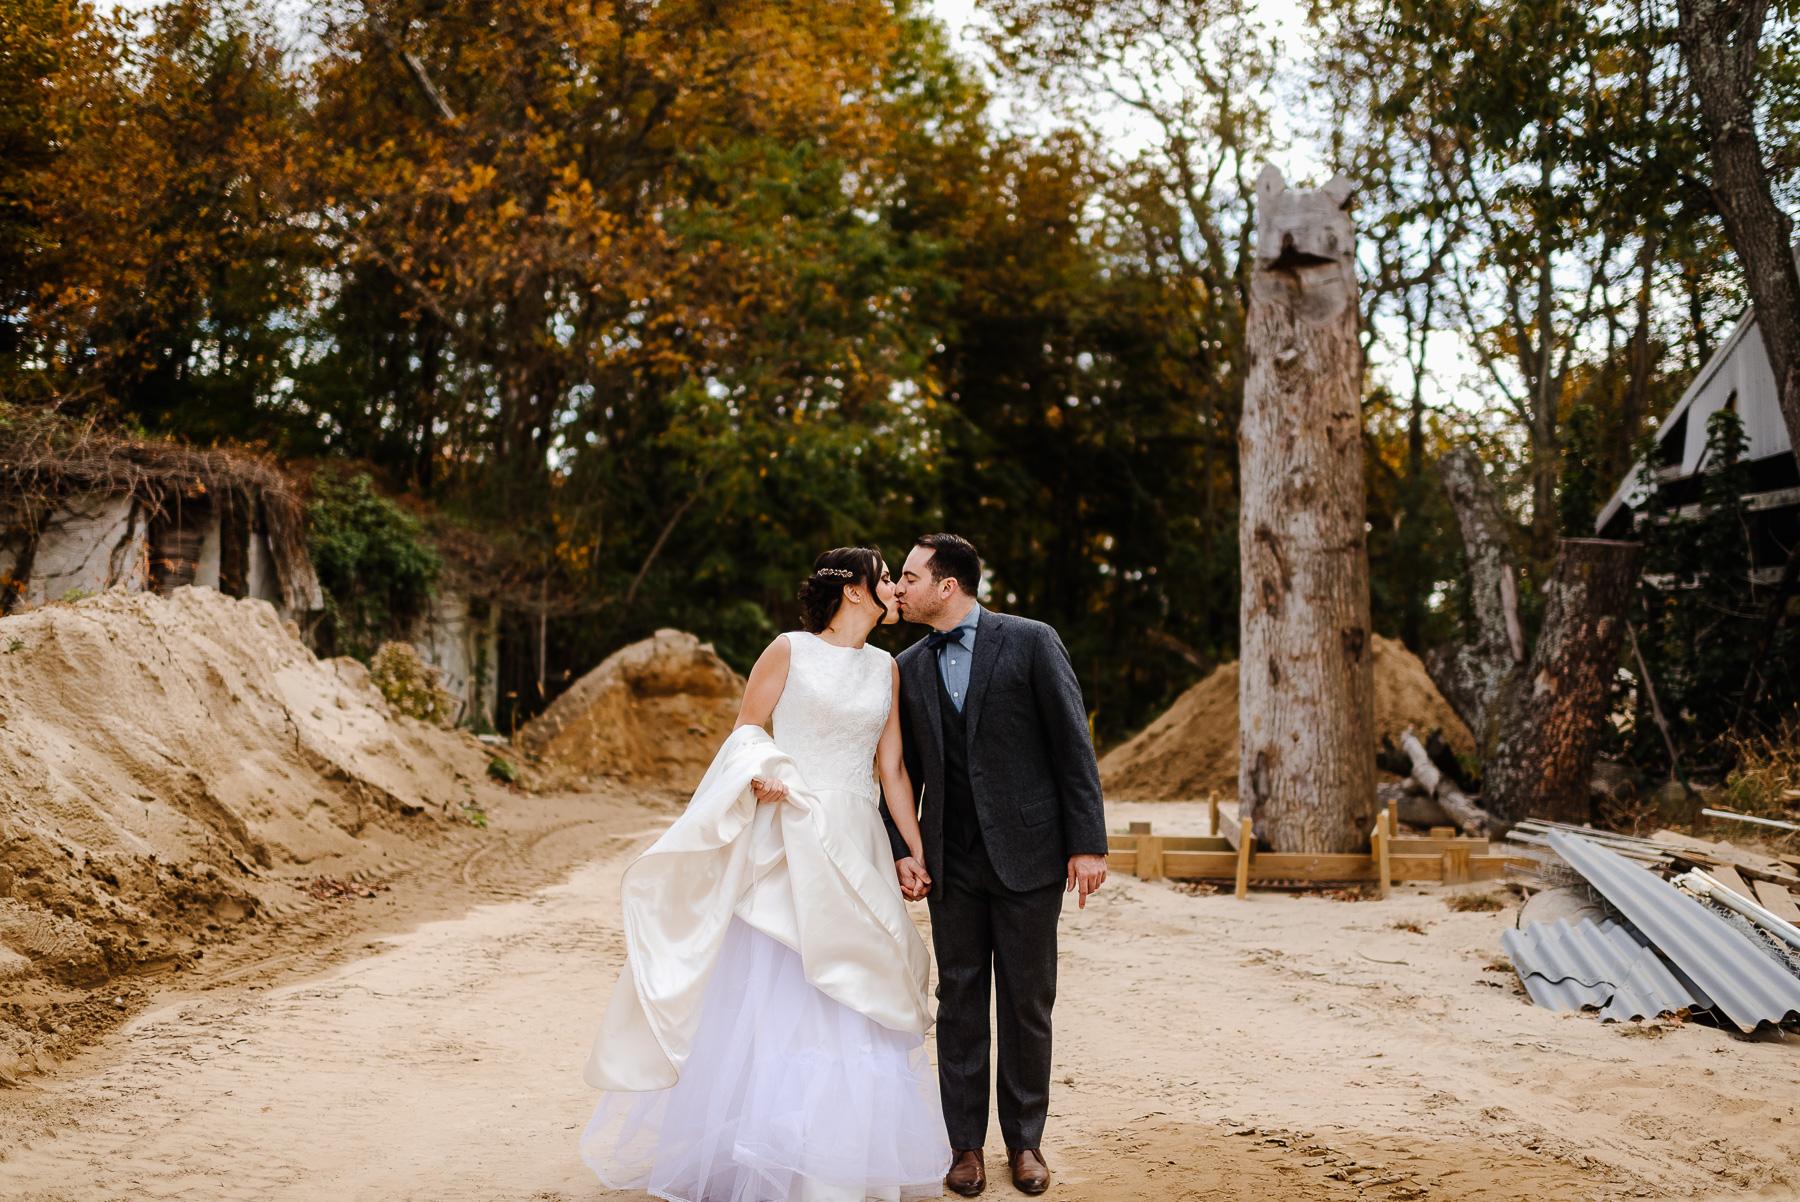 46-Laurita Winery Wedding New Jersey Wedding Photographer Laurita Winery Weddings Longbrook Photography.jpg